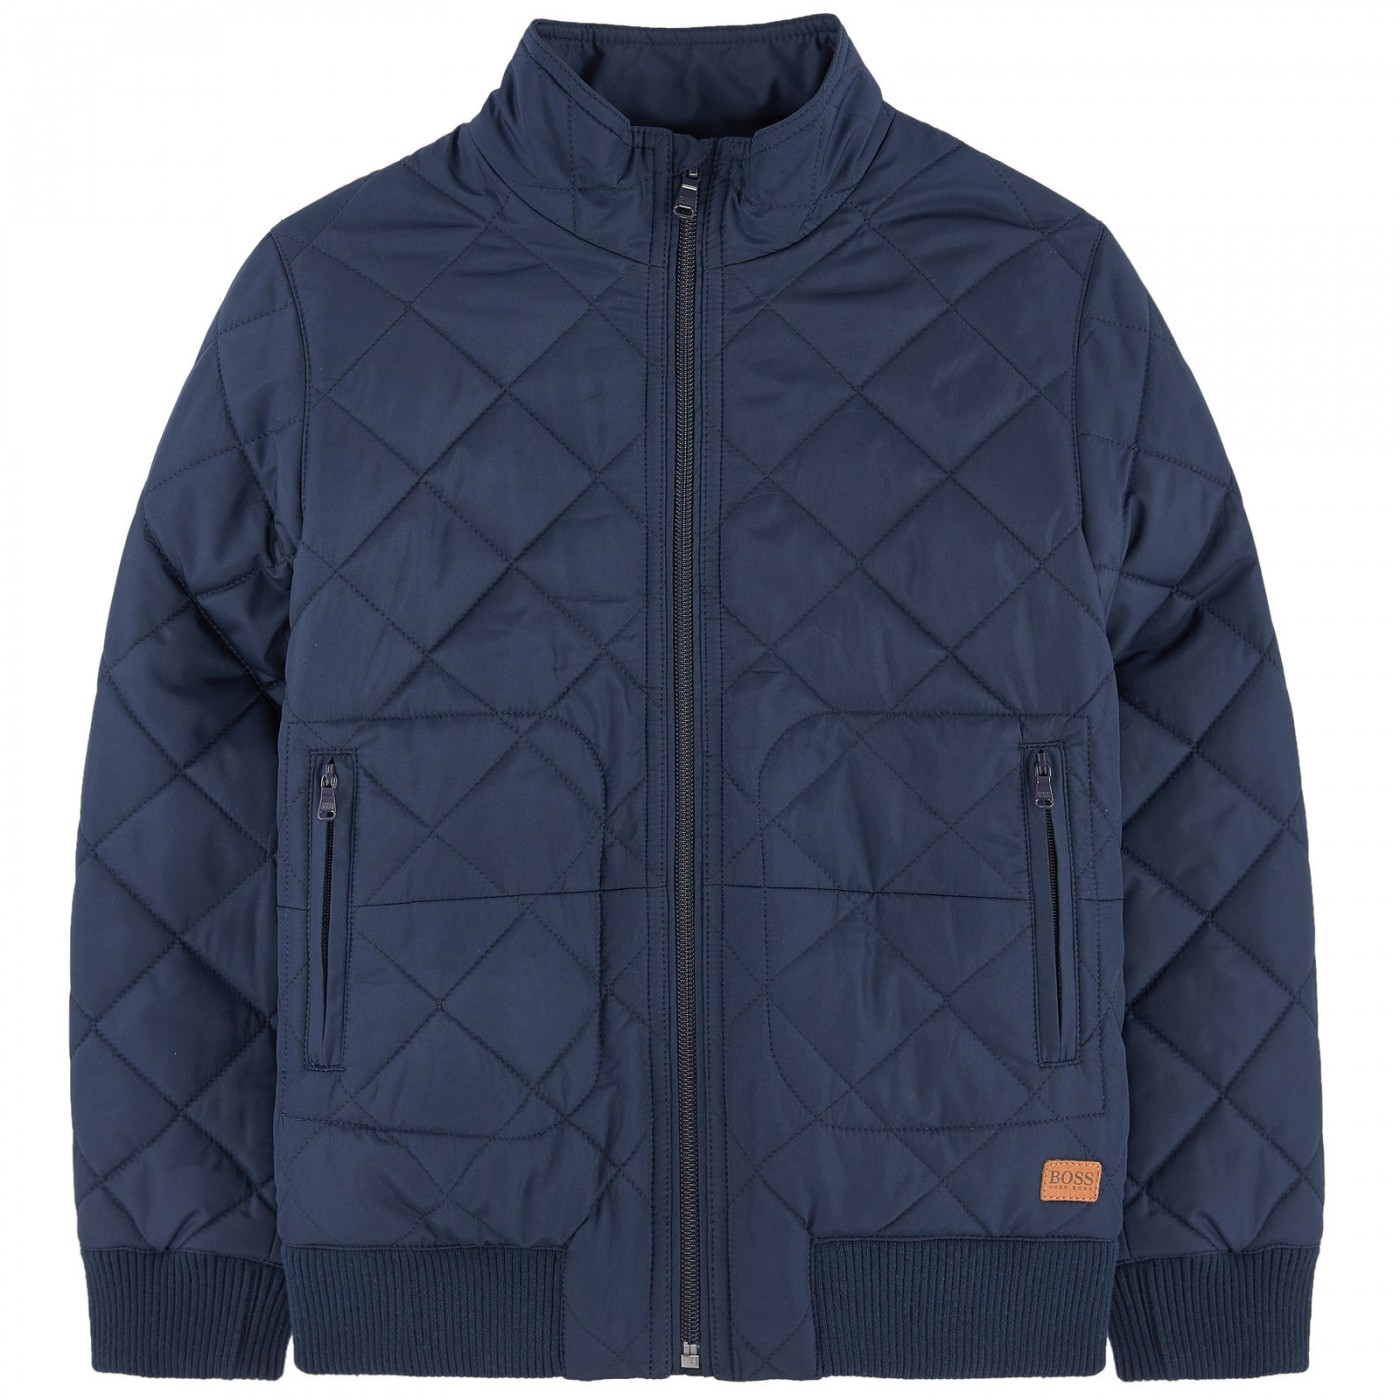 Куртка Hugo Boss J26300-849